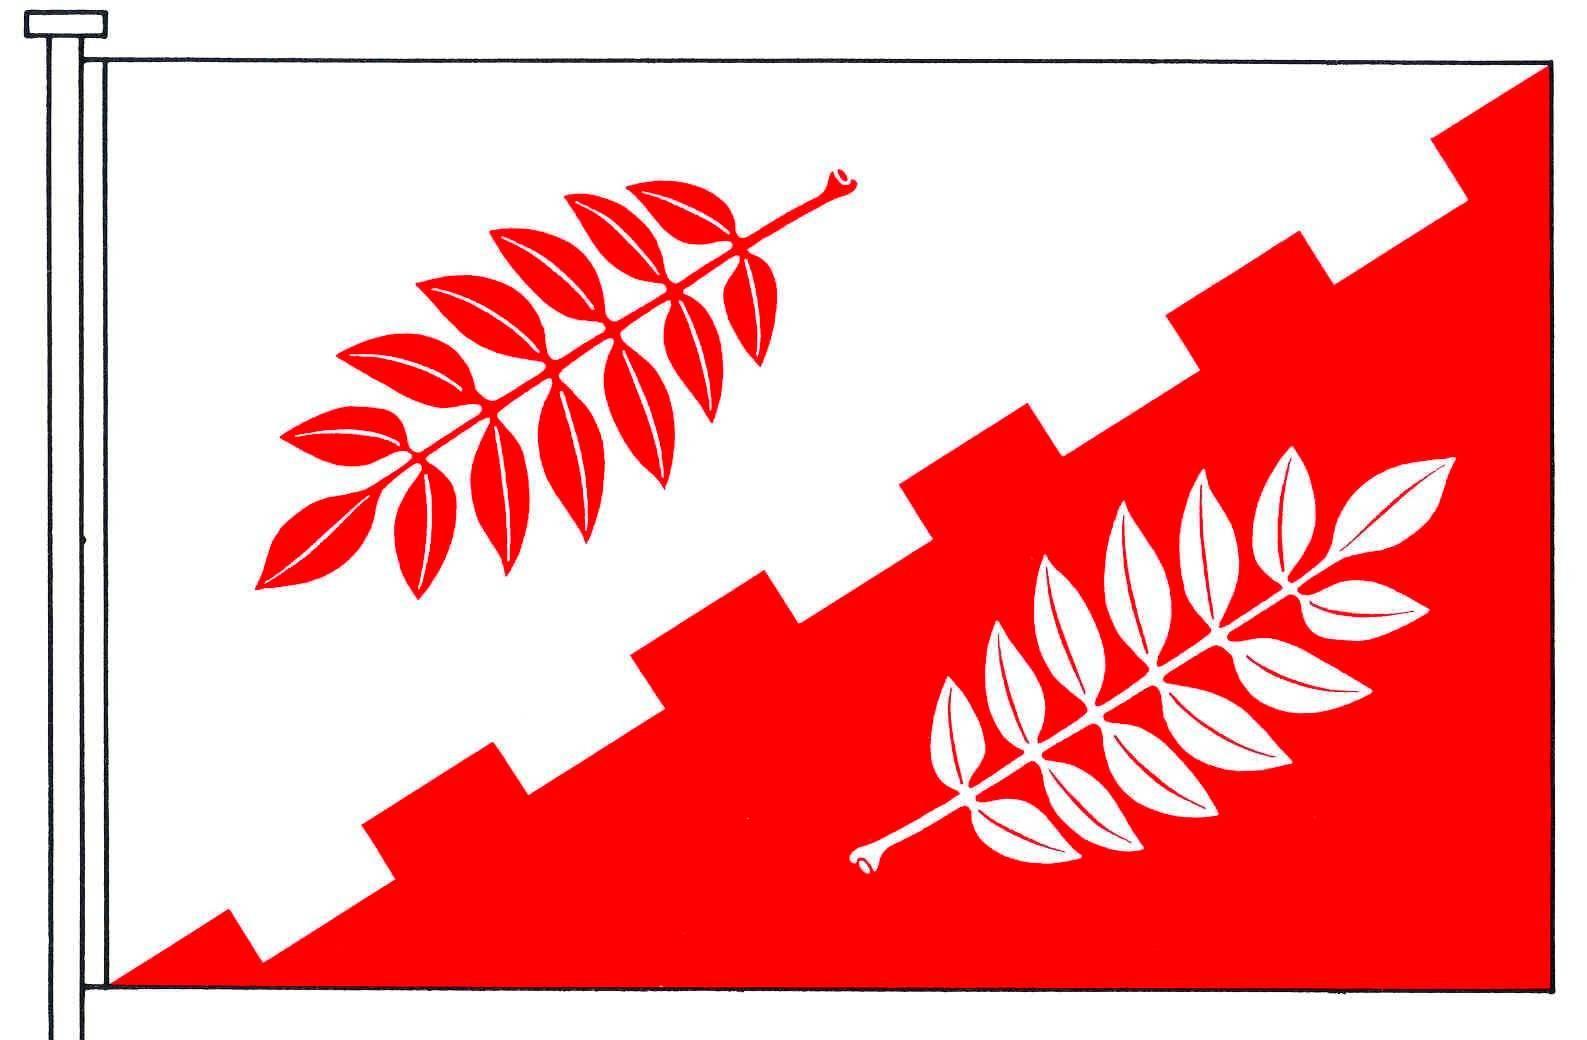 Flagge GemeindeAltenhof, Kreis Rendsburg-Eckernförde